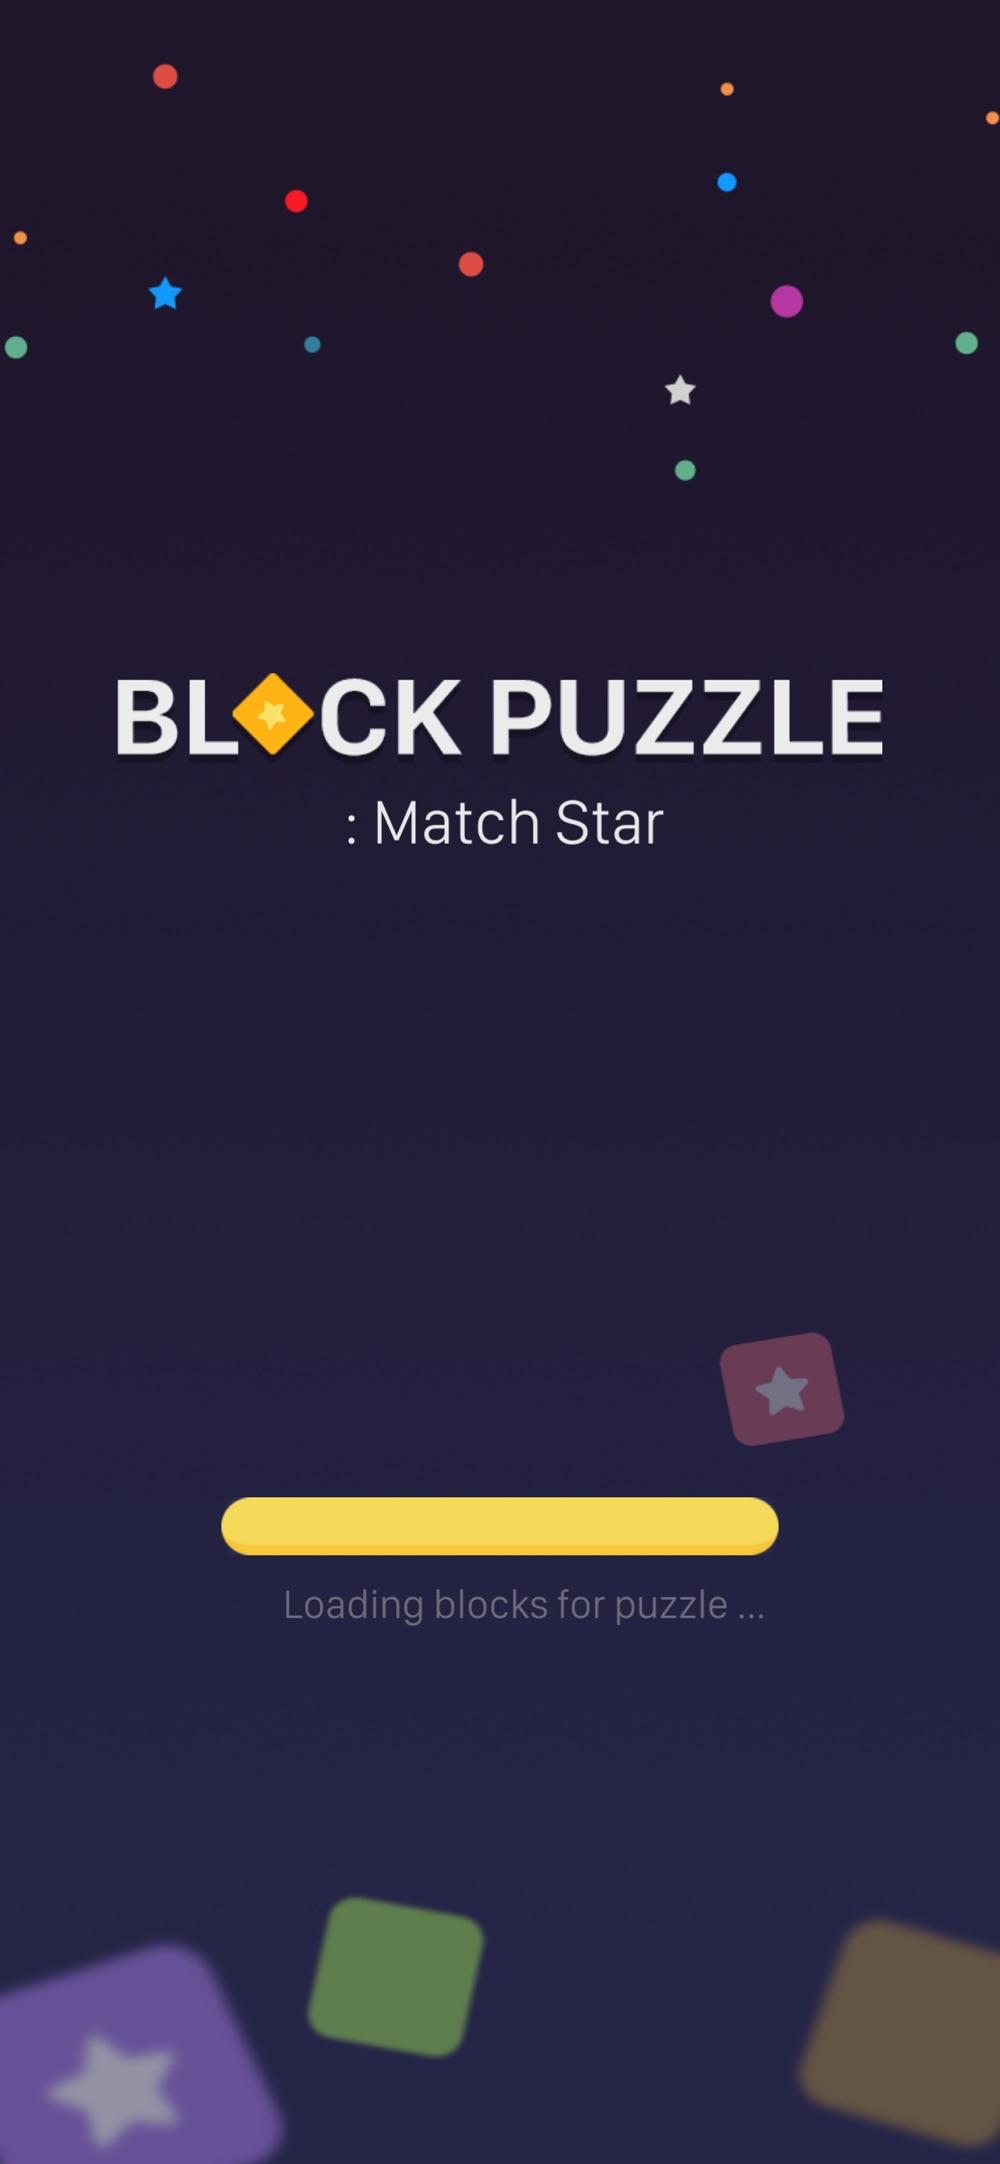 Block Puzzle: Match Star Cheat Codes